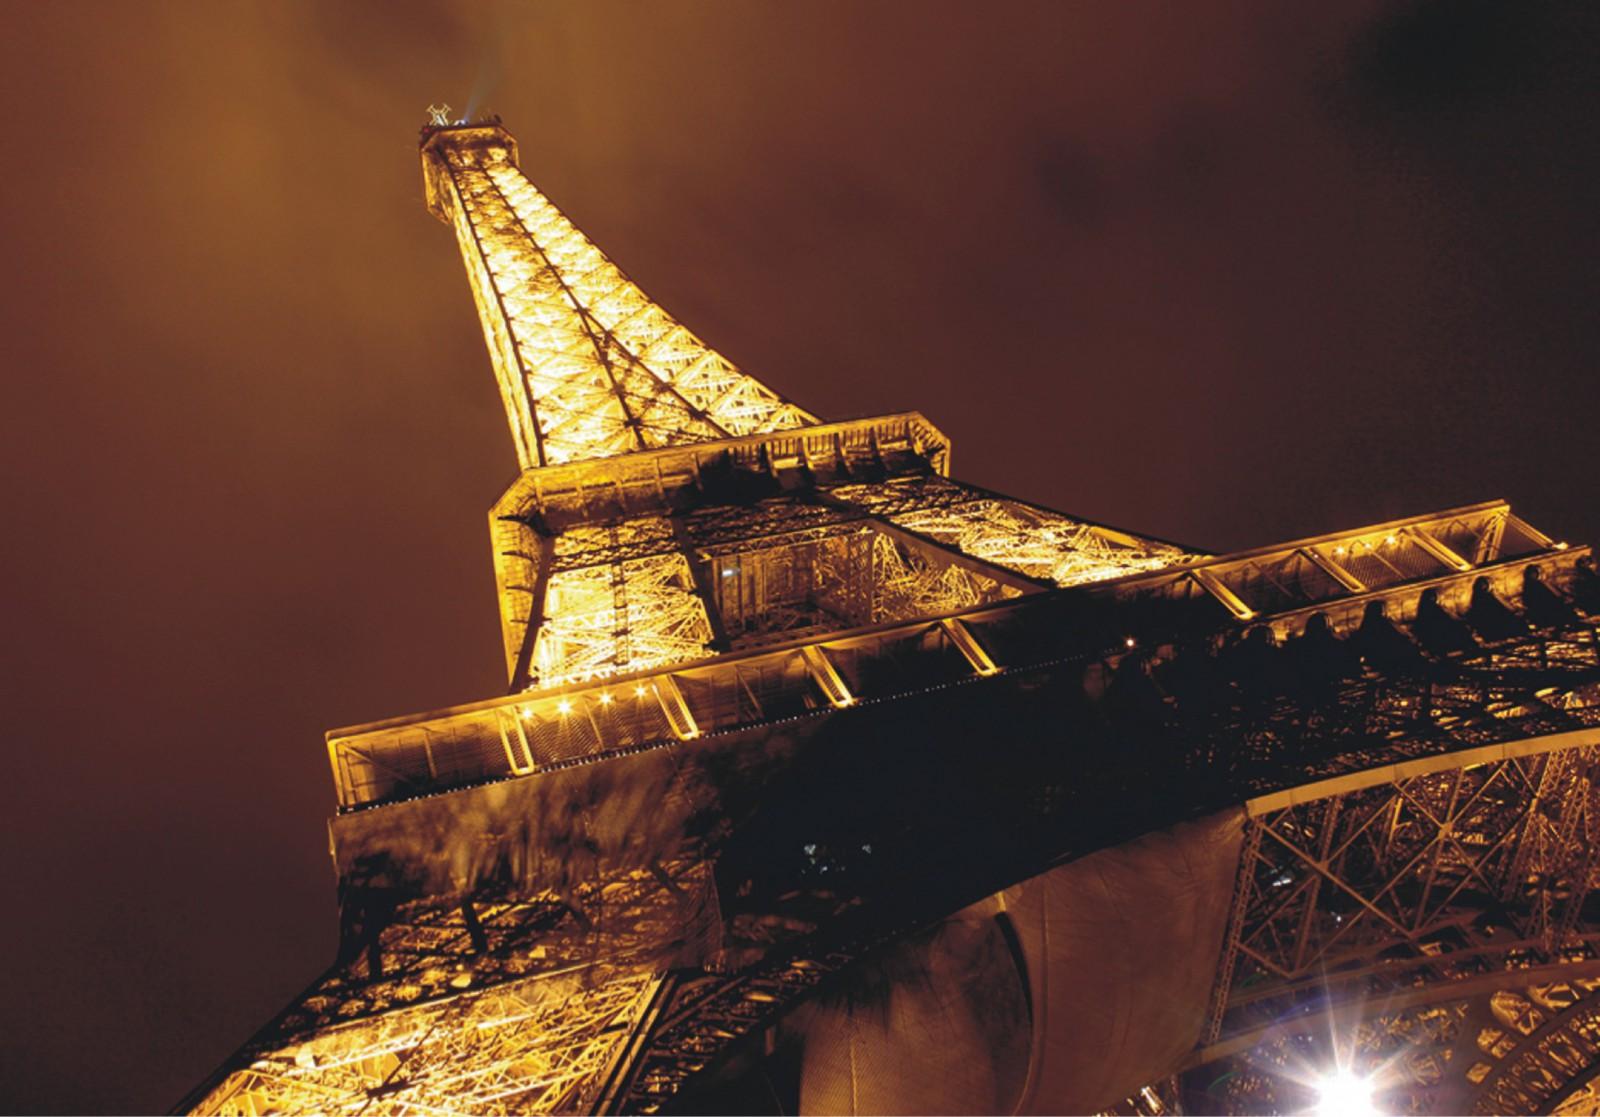 Xxl photo wallpaper mural eiffel tower paris skyline for Eiffel tower wallpaper mural